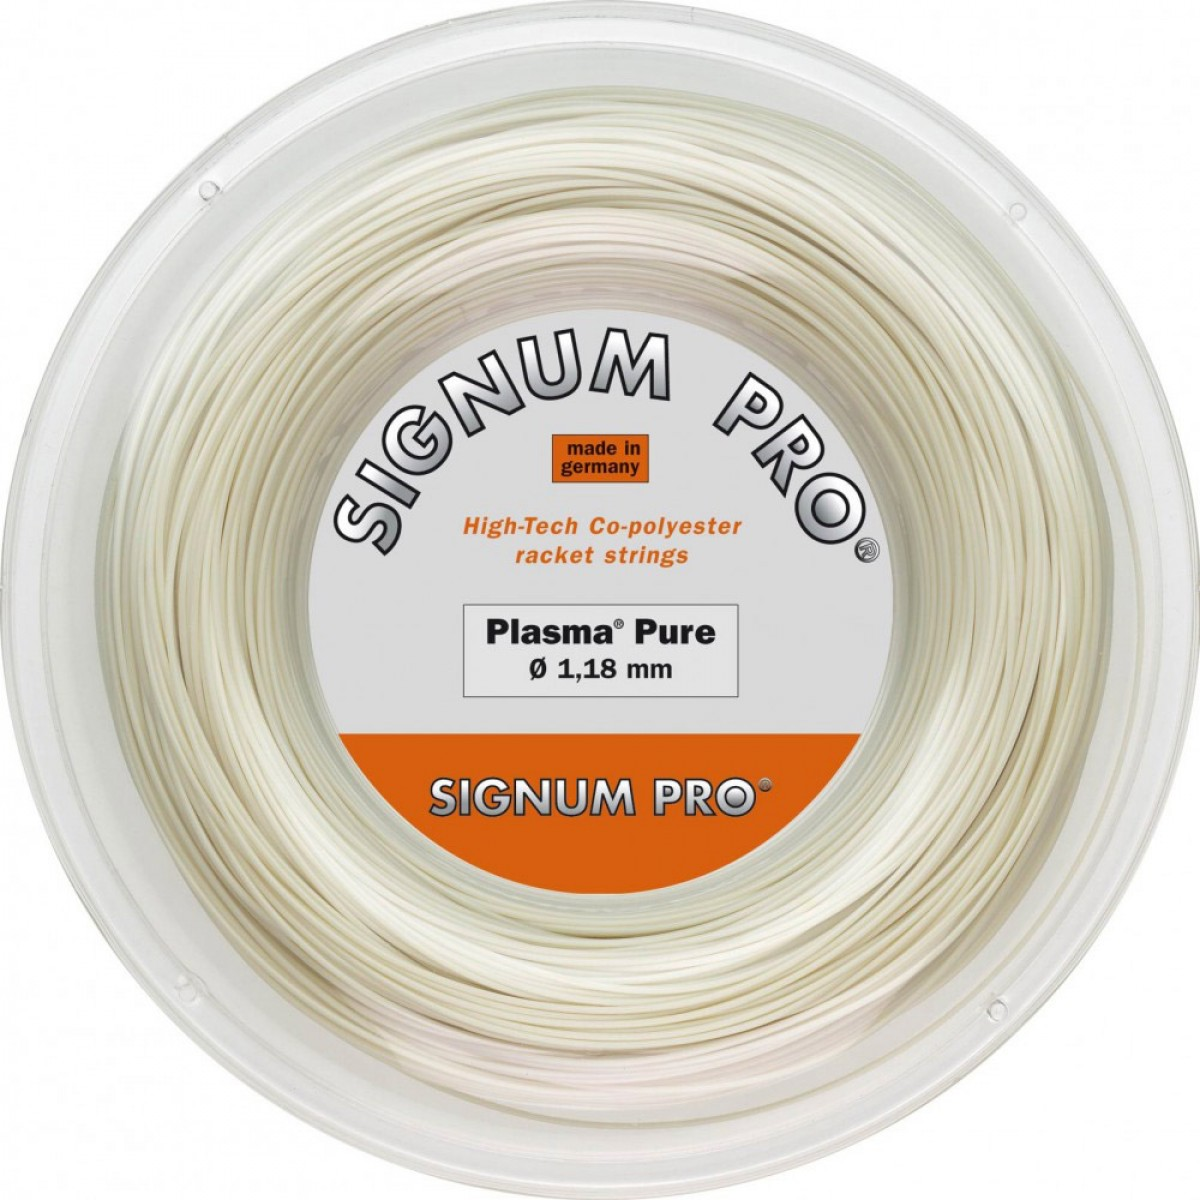 BOBINE SIGNUM PRO PLASMA PURE (200 METRES)